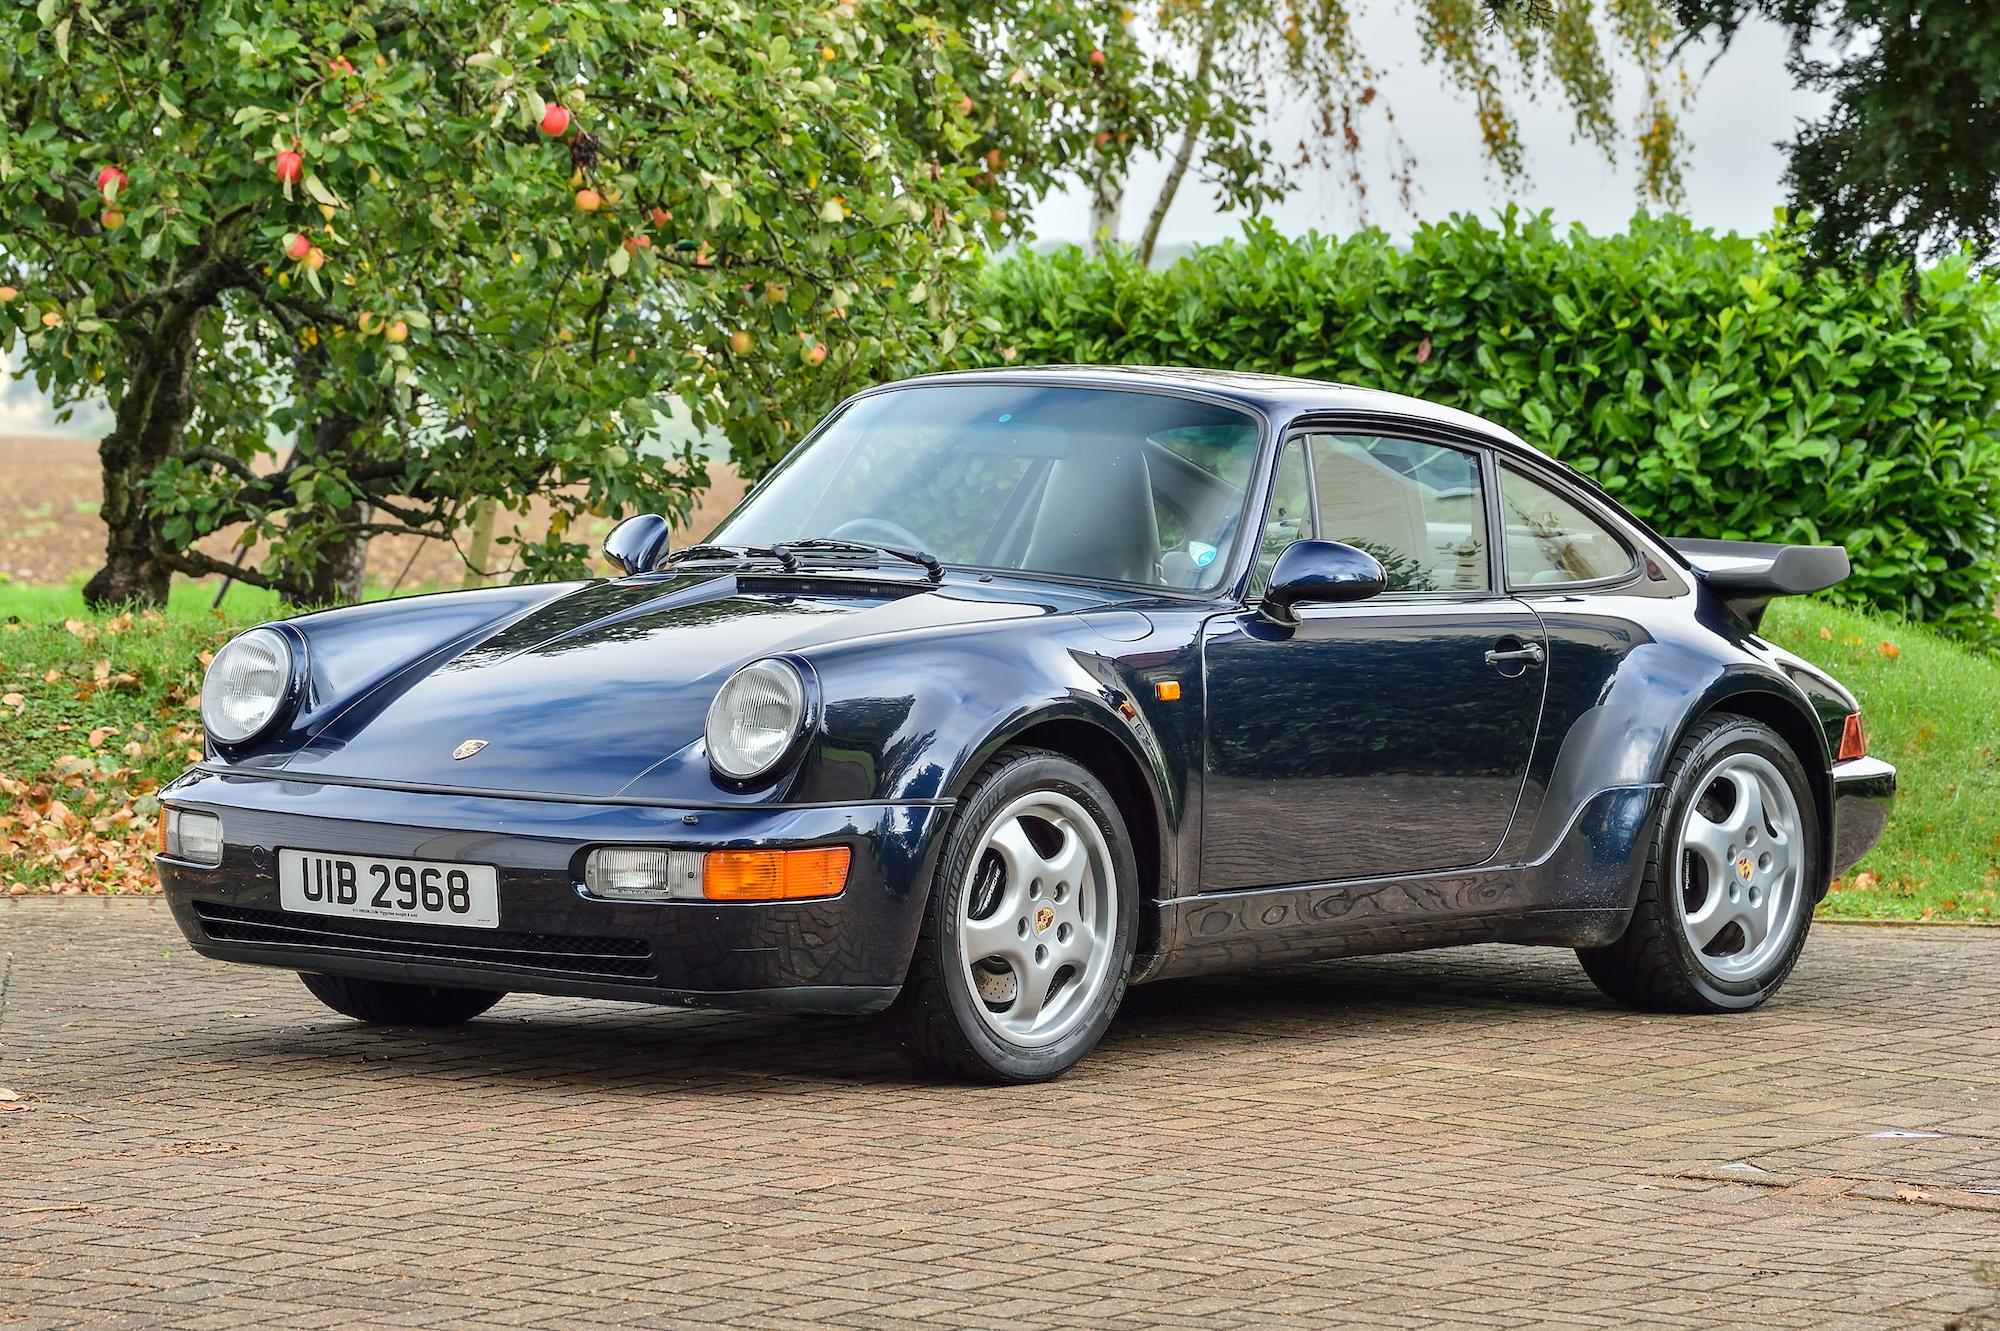 1991 PORSCHE 911 (964) TURBO 3.3